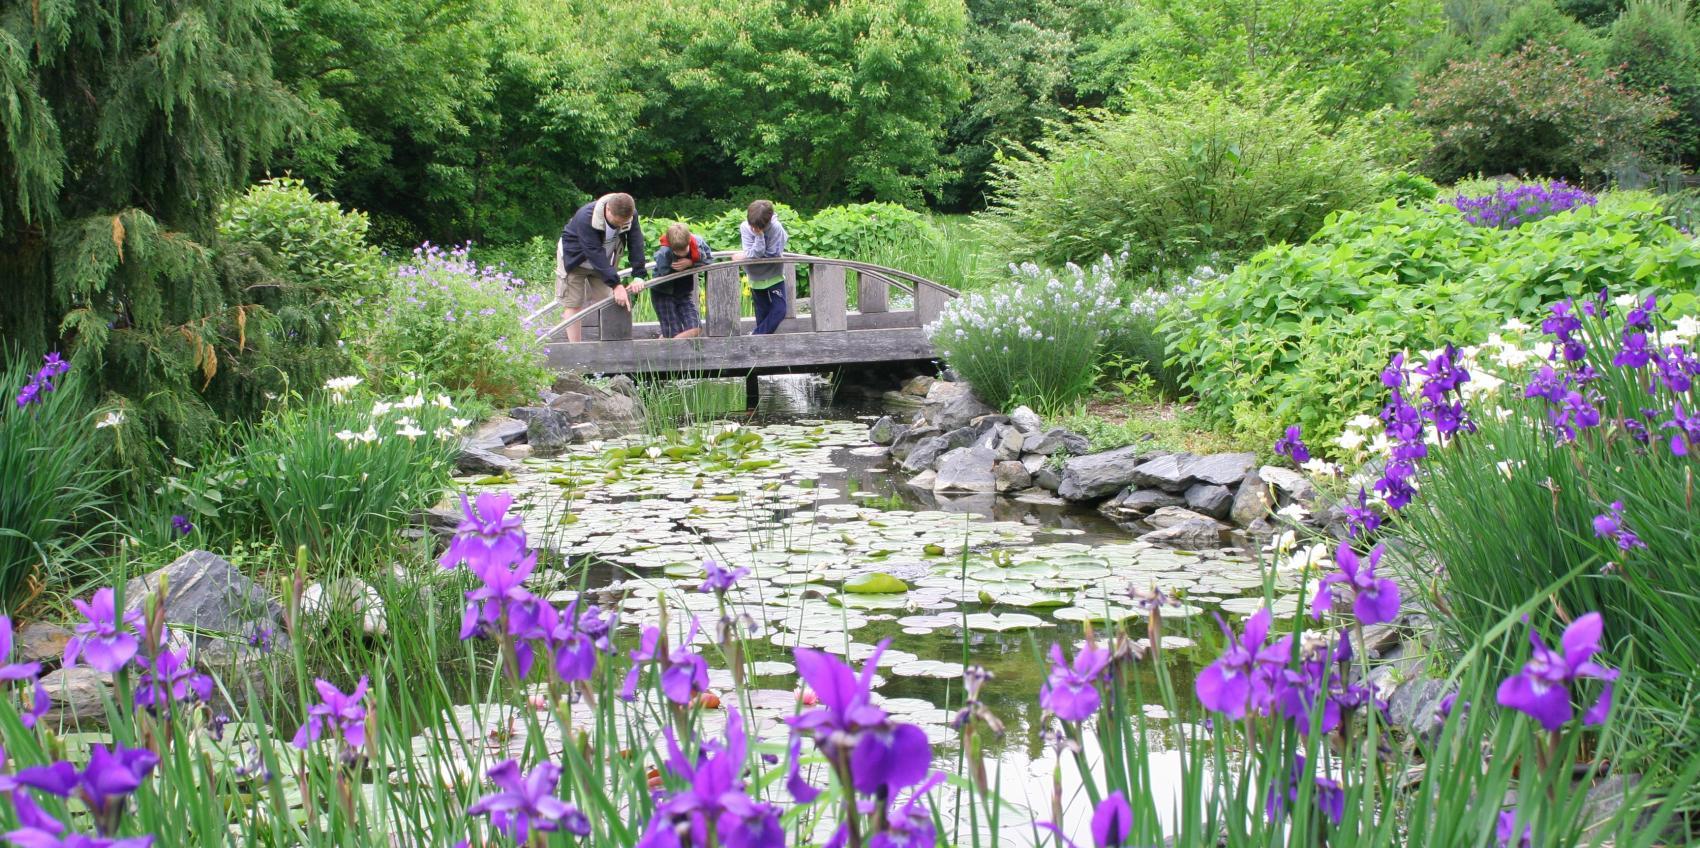 Klehm Arboretum Botanic Garden American Public Gardens Association